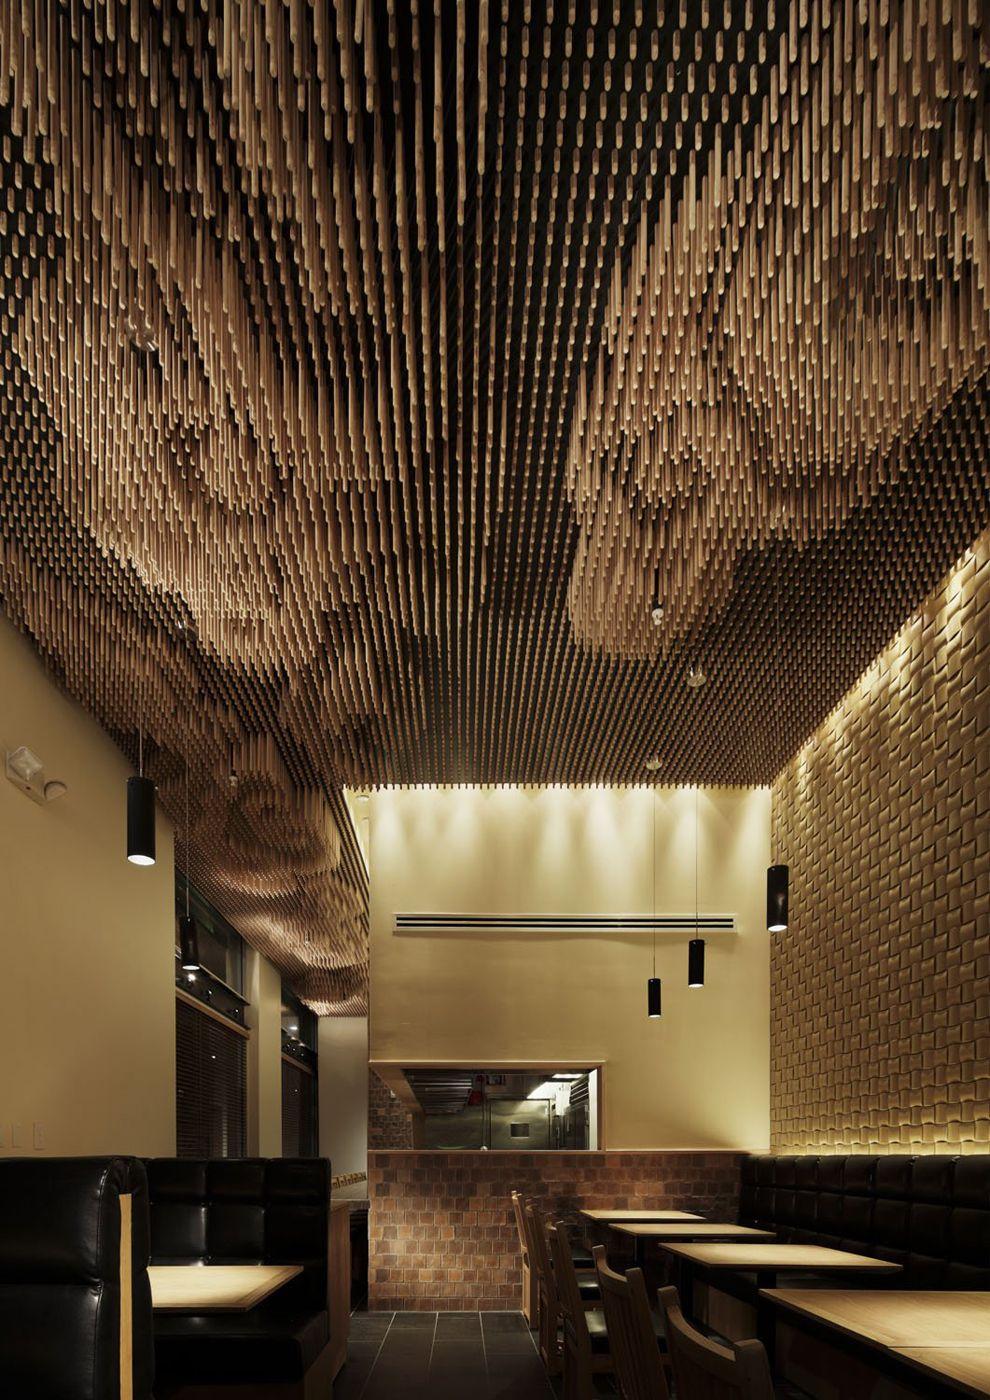 Tsujita Restaurant / Takeshi Sano   Restaurants, Ceiling and Ceilings